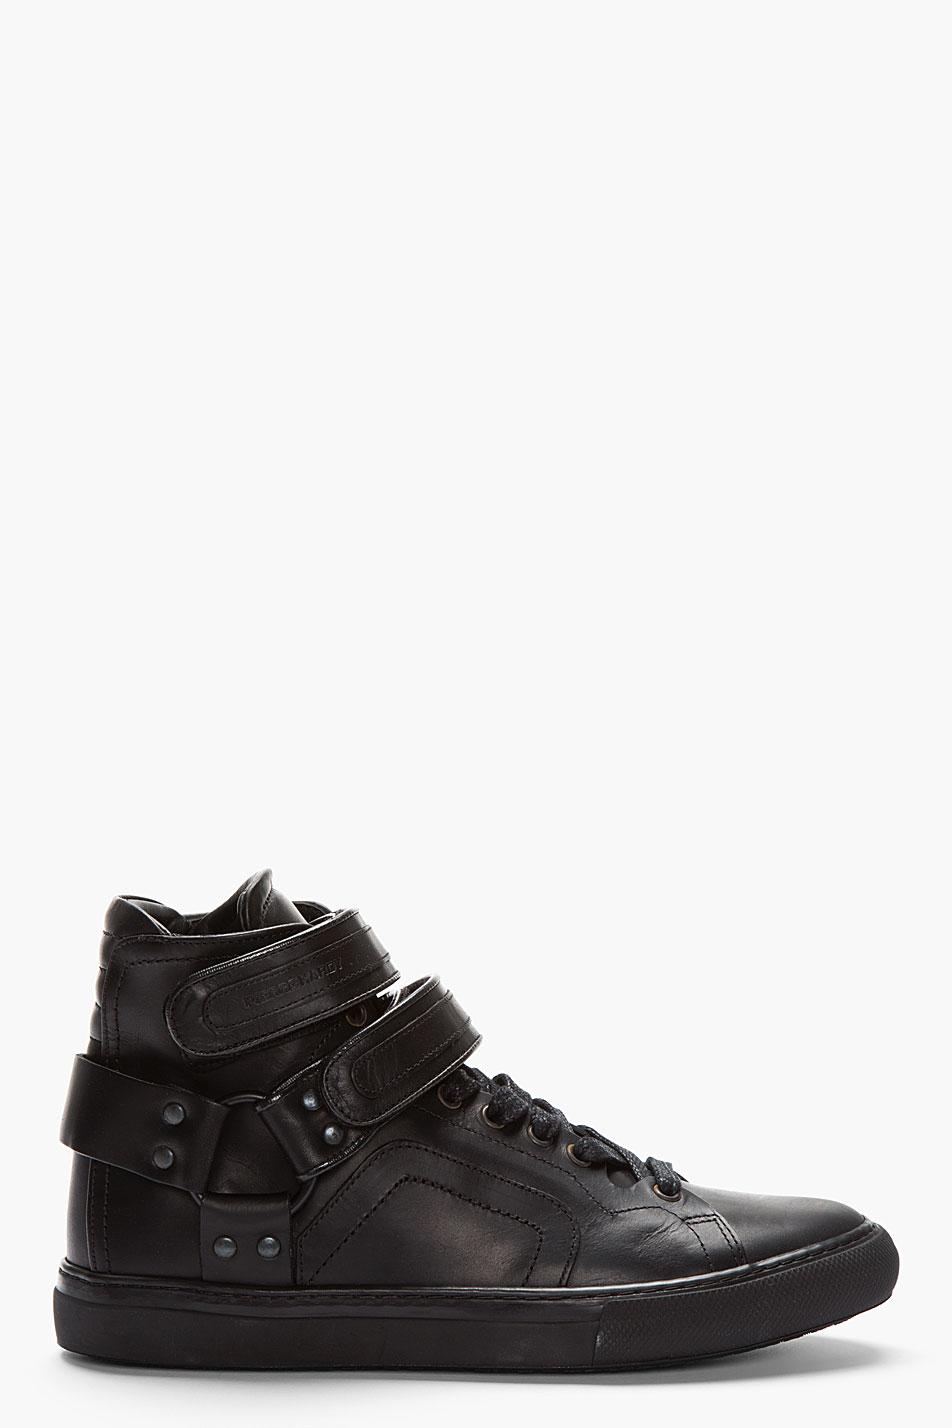 Lyst Pierre Hardy Black Leather Multi Strap Velcro High